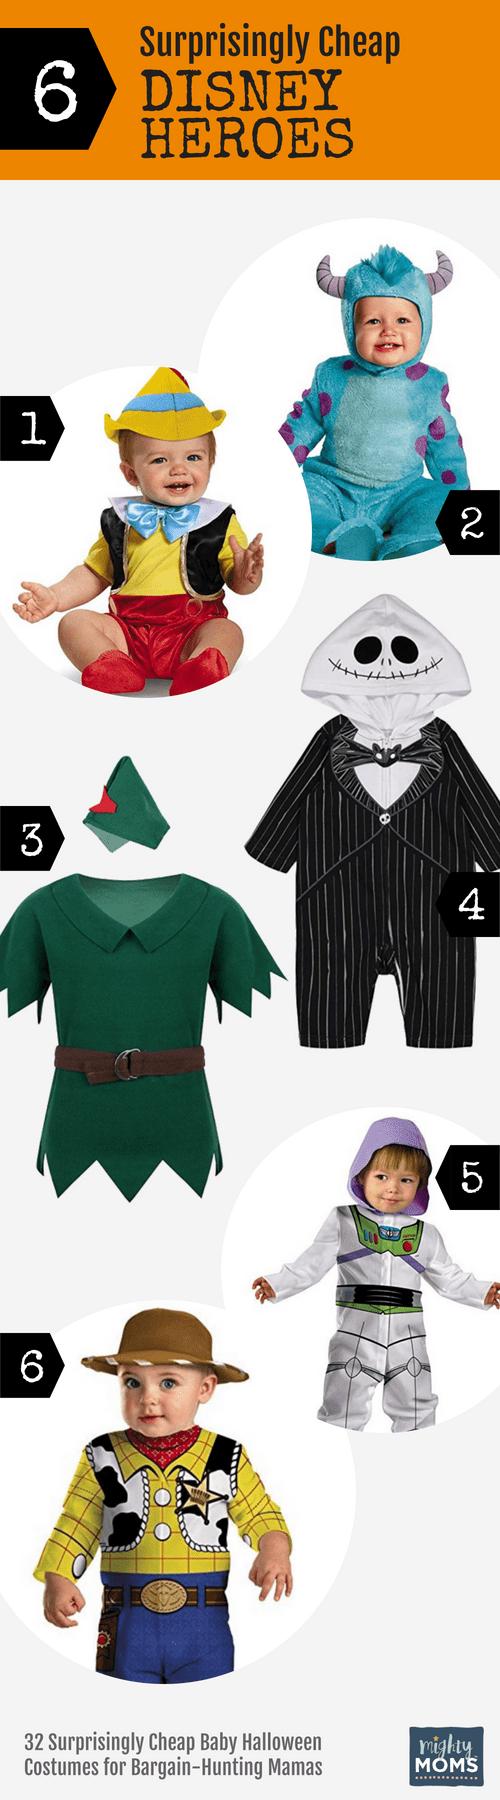 Cheap Disney Hero Baby Halloween Costumes - MightyMoms.club